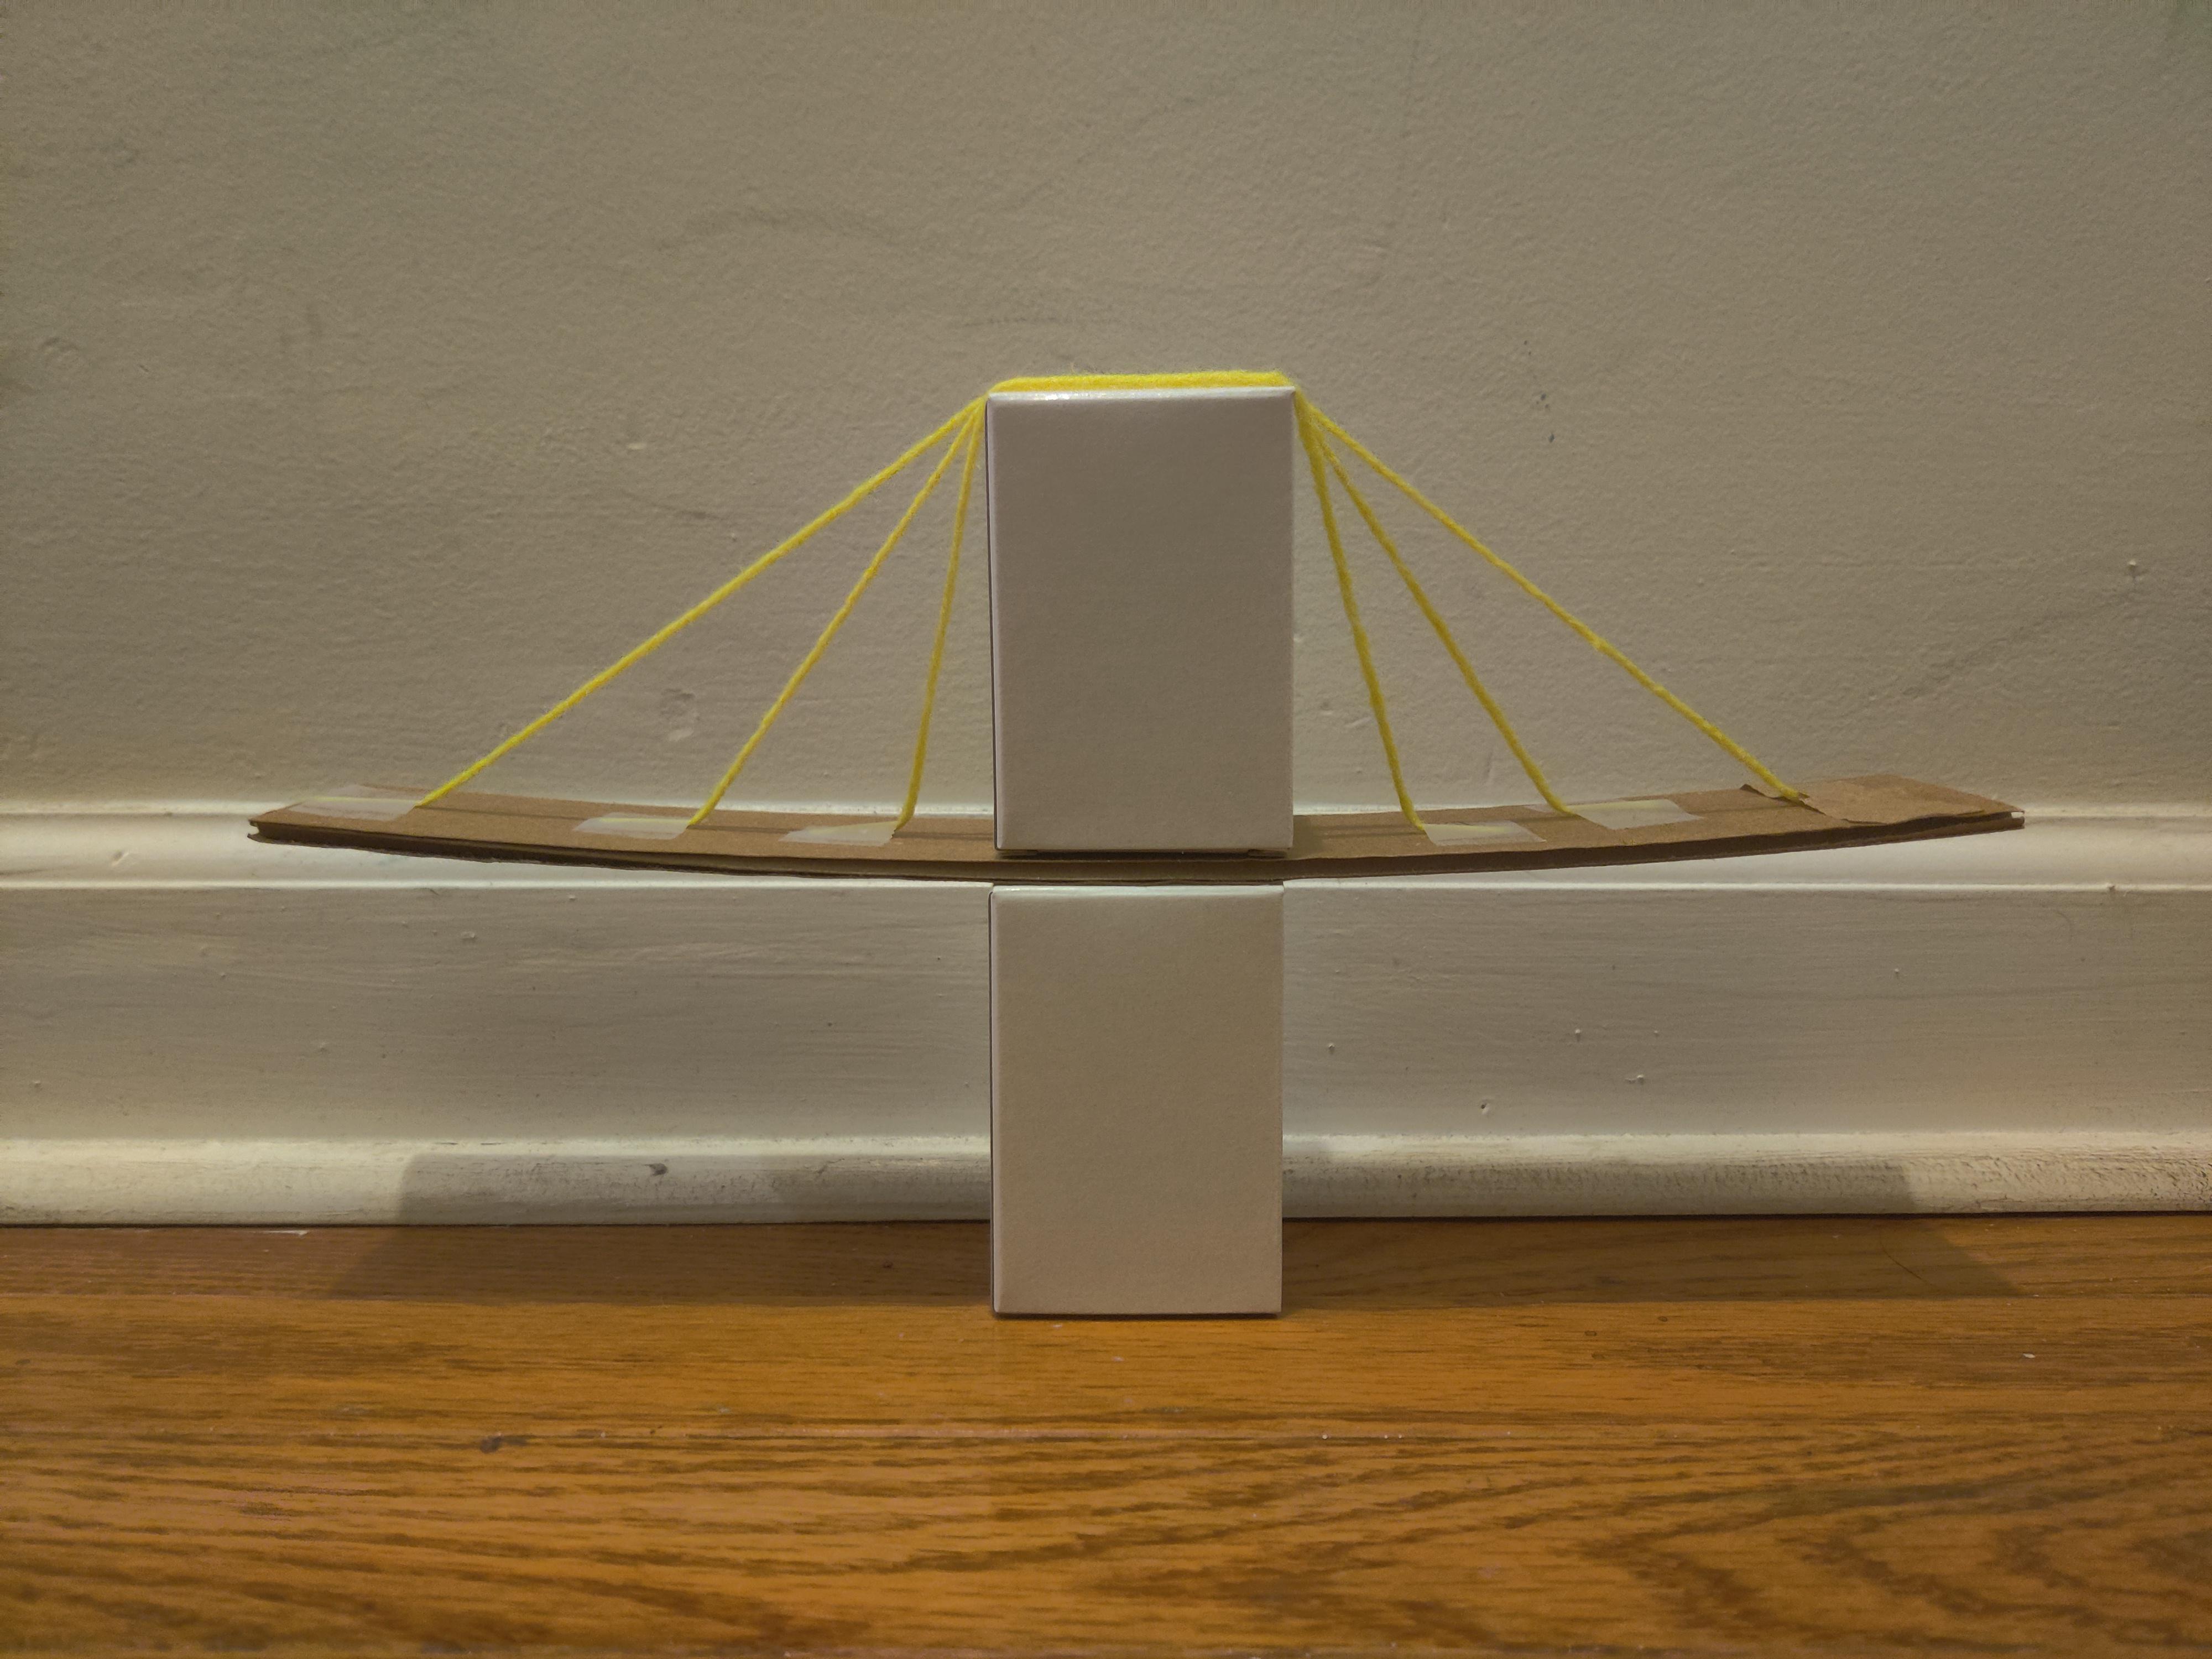 Architecture at Home: Suspension Bridges at Center for Architecture